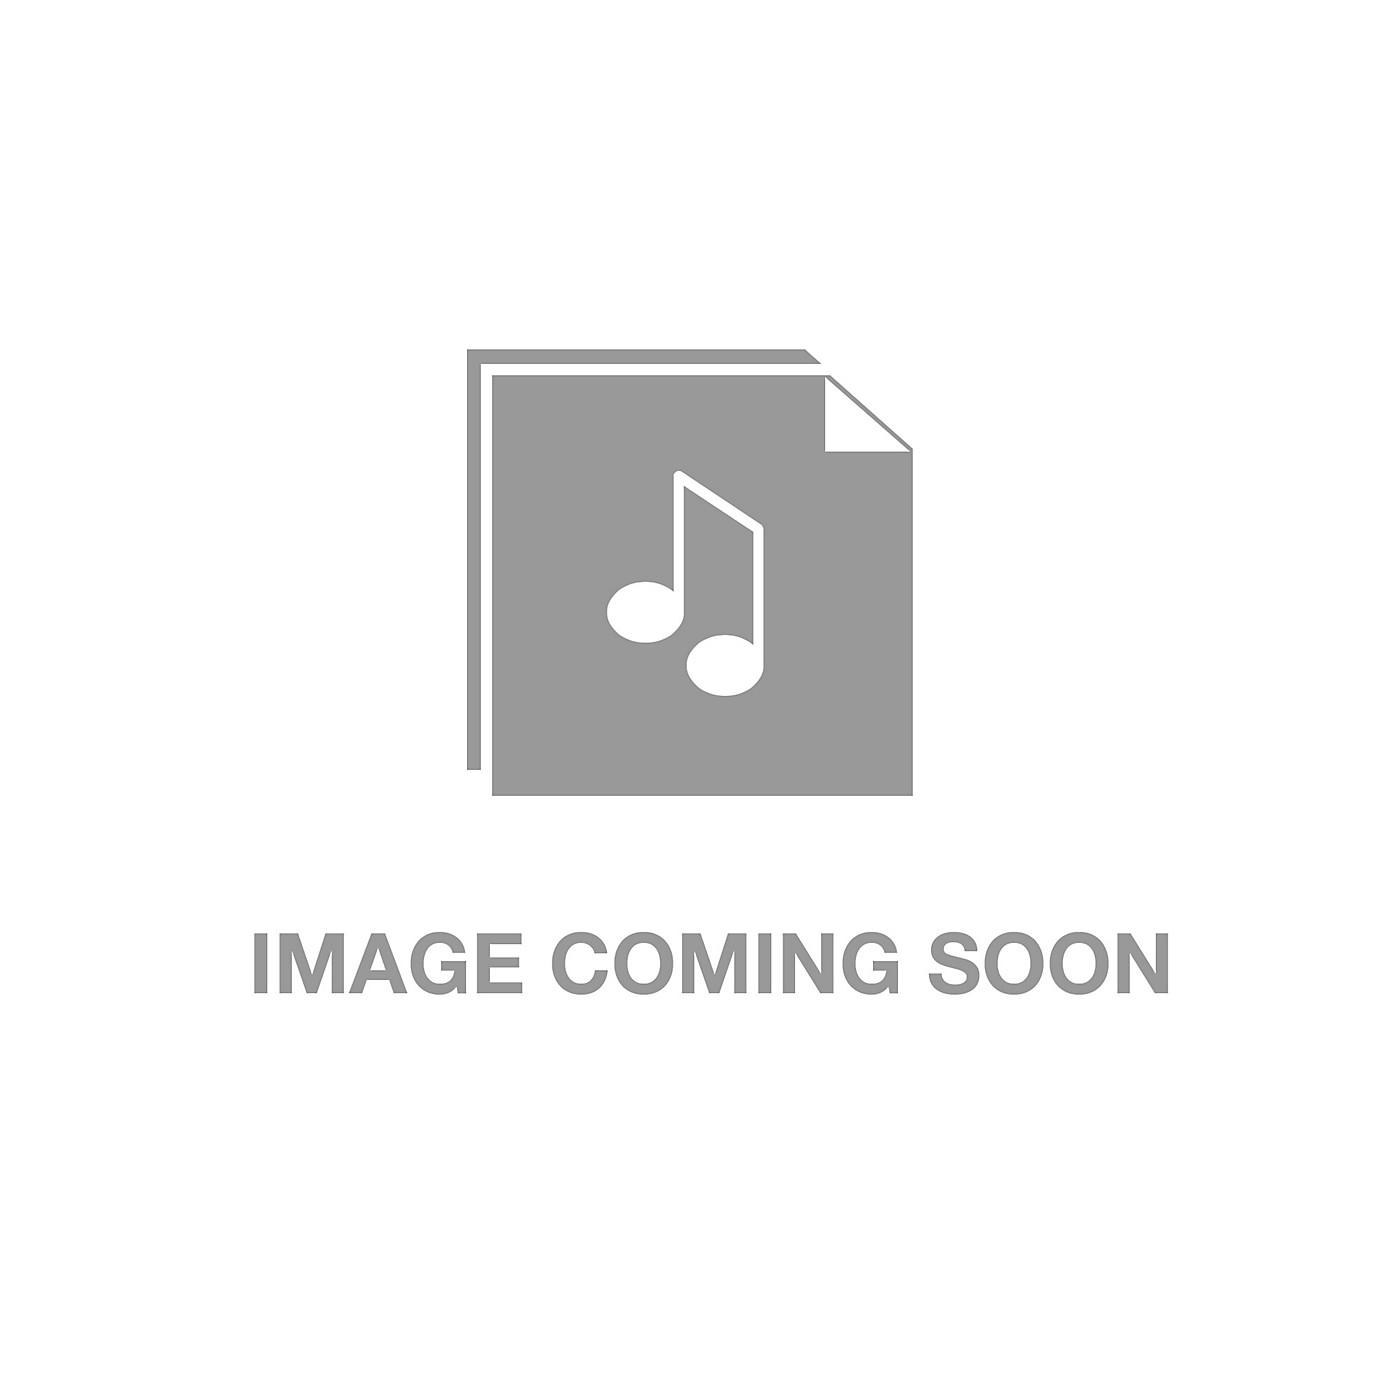 Lauren Keiser Music Publishing Psalm 23 (for SSATB Chorus) Full Score Composed by Coleridge-Taylor Perkinson thumbnail